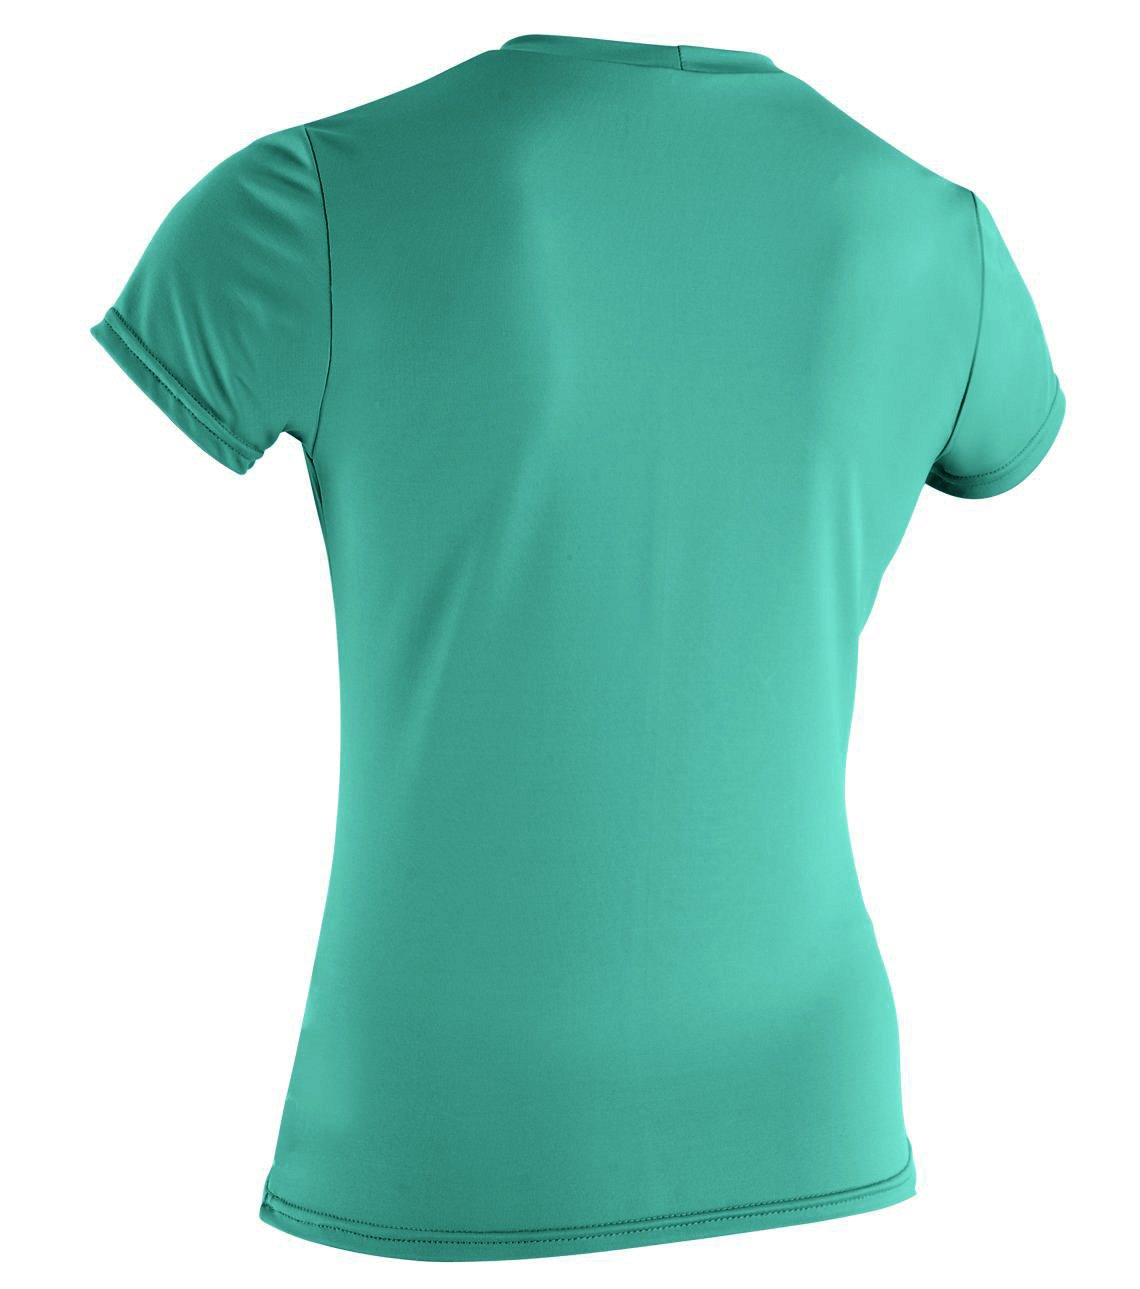 O'Neill  Women's Basic Skins Upf 50+ Short Sleeve Sun Shirt, Seaglass, X-Large by O'Neill Wetsuits